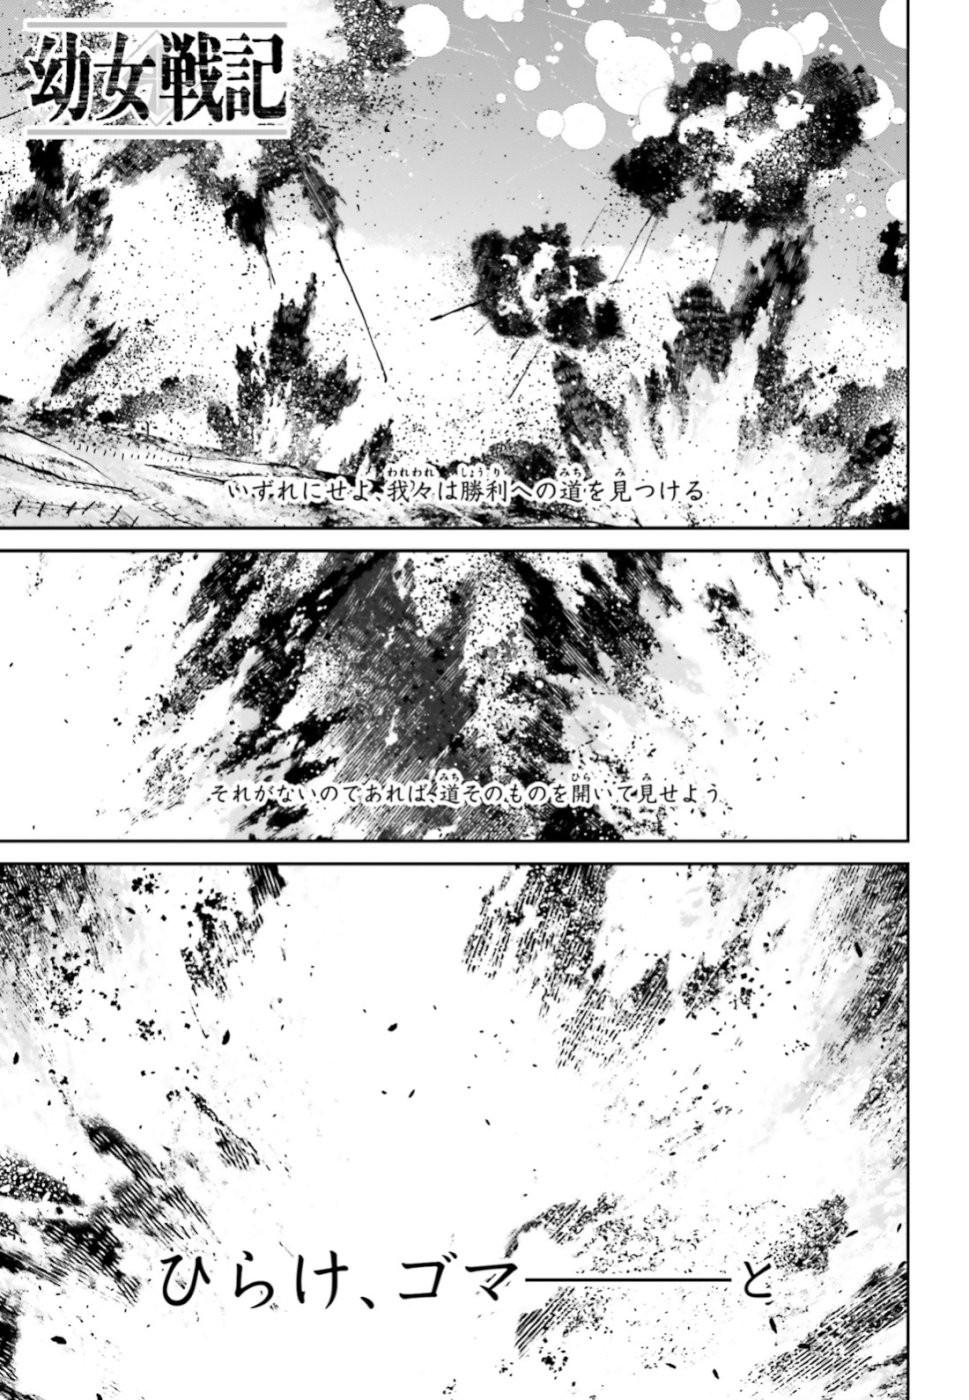 Youjo Senki - Chapter 44 - Page 1